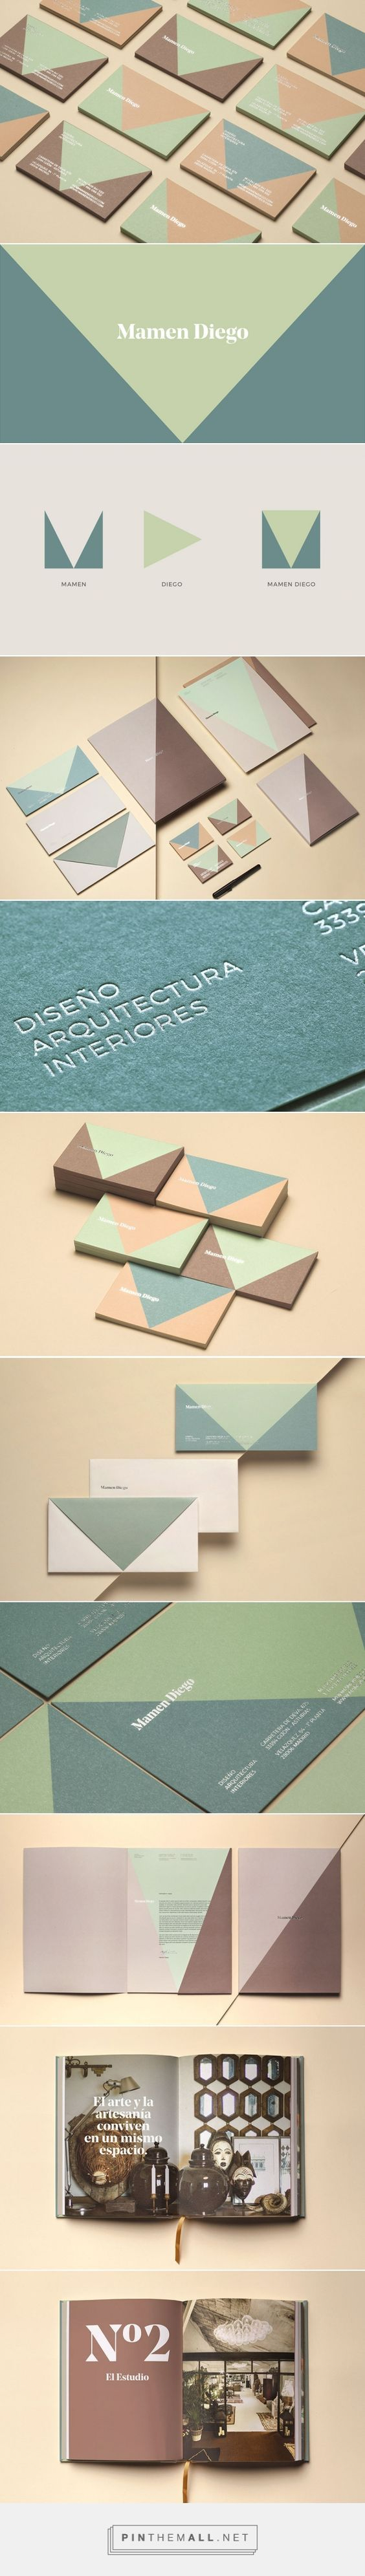 Mamen Diego Branding by Atipo | Fivestar Branding – Design and Branding Agency & Inspiration Gallery